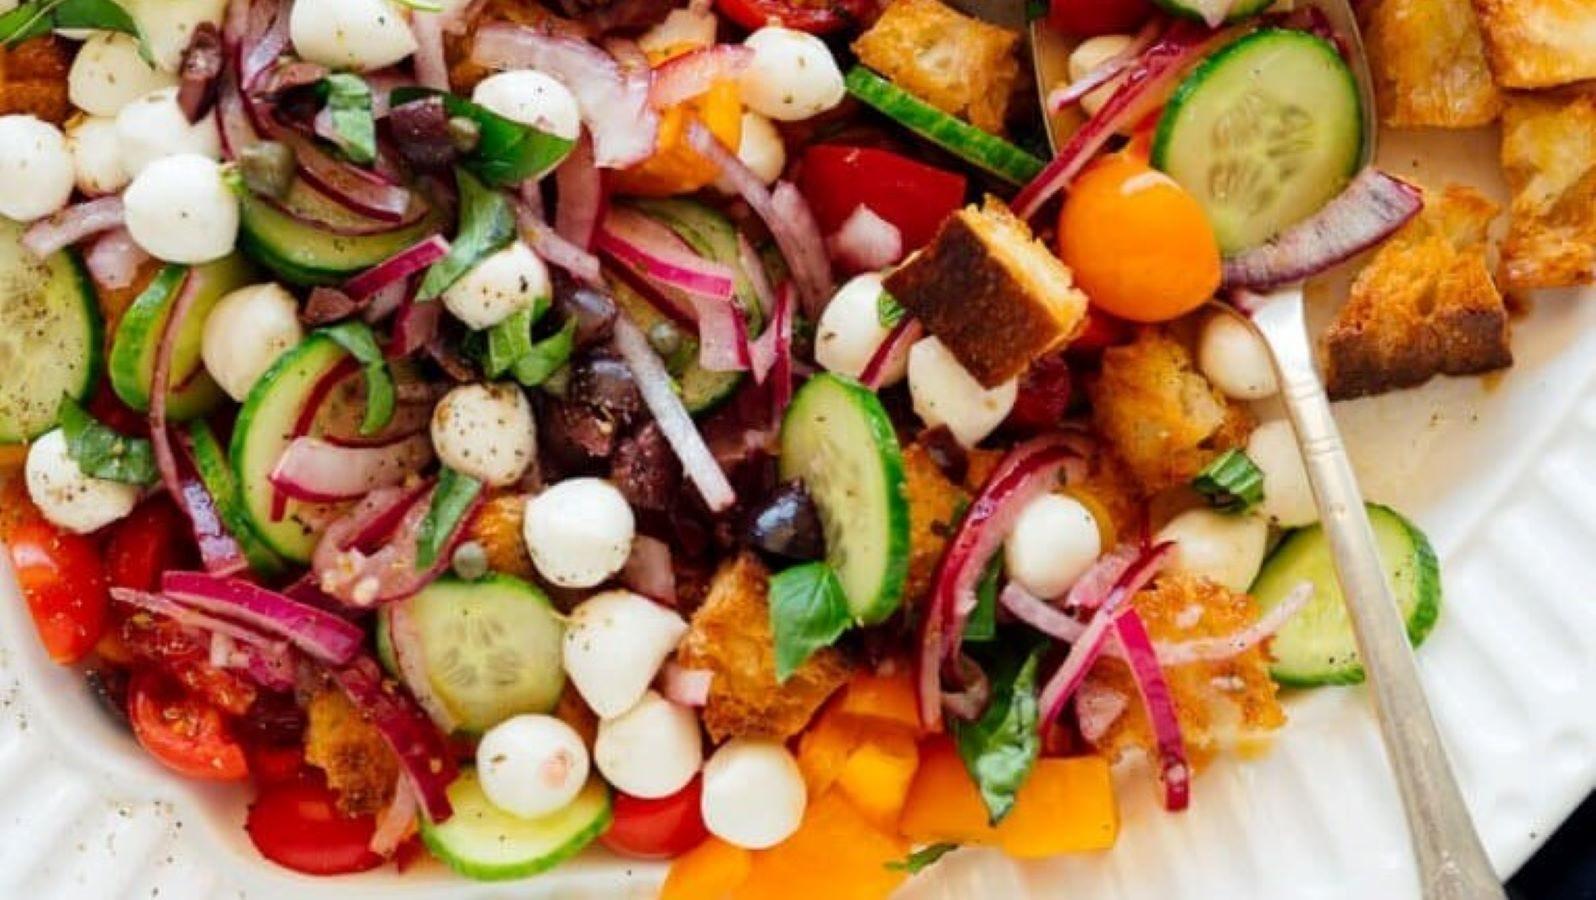 A plate full of Panzanella salad.